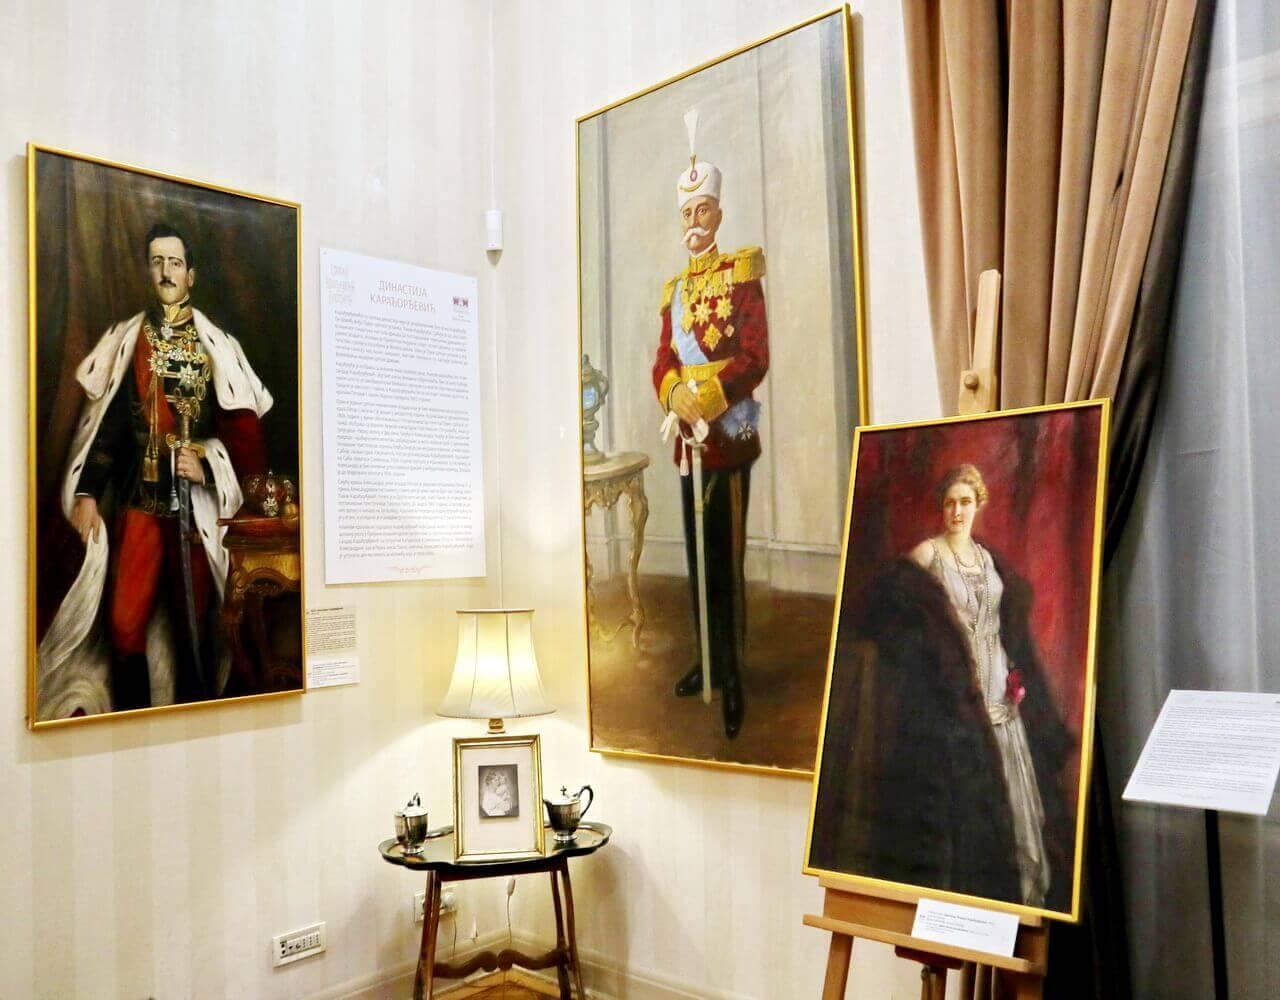 Karadjordjevic dynasty: King Alexander I, King Peter I and Queen Maria